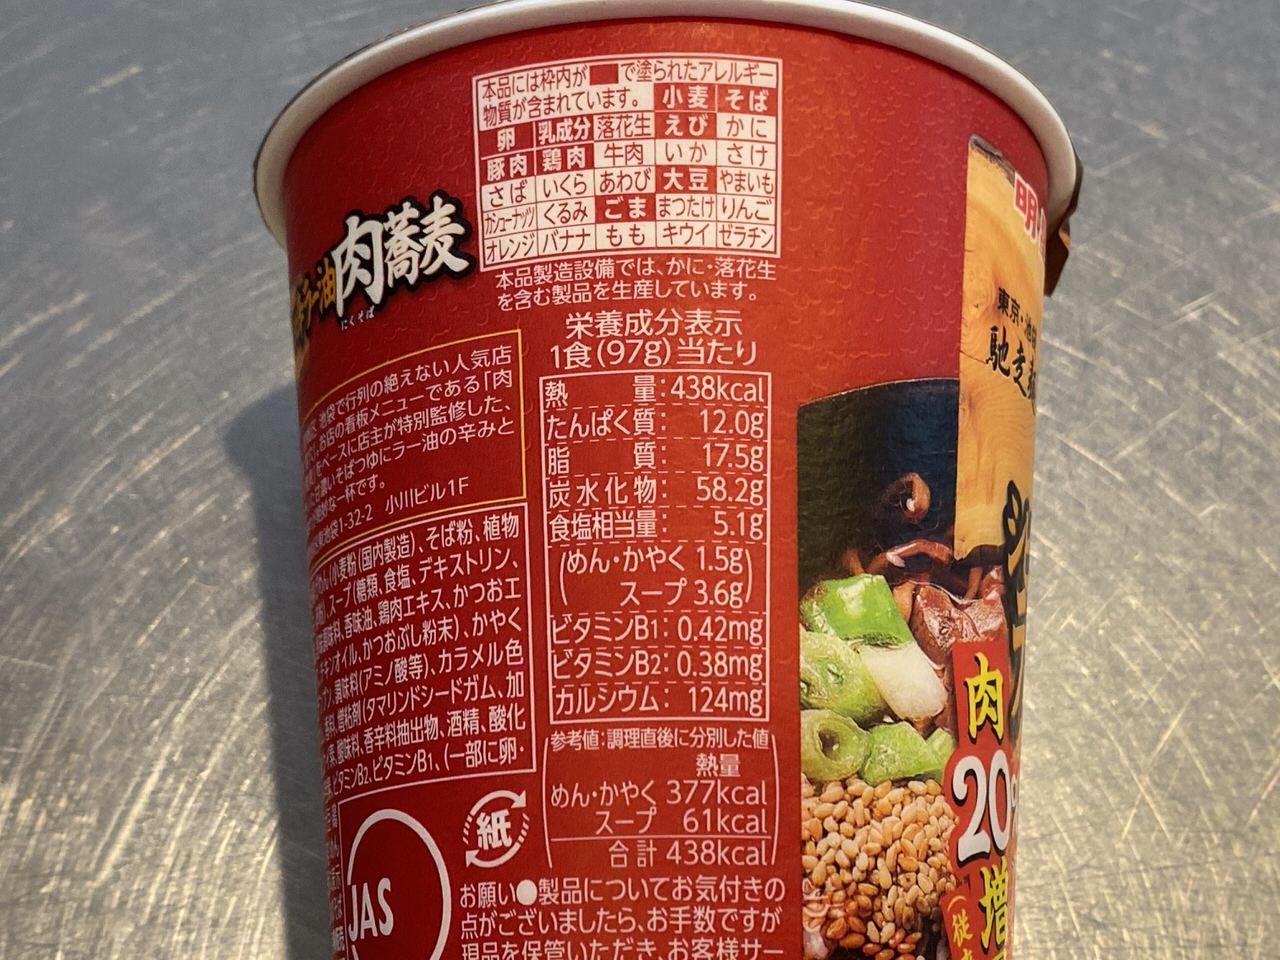 「馳走麺 狸穴監修 シビ辛ラー油肉蕎麦」10